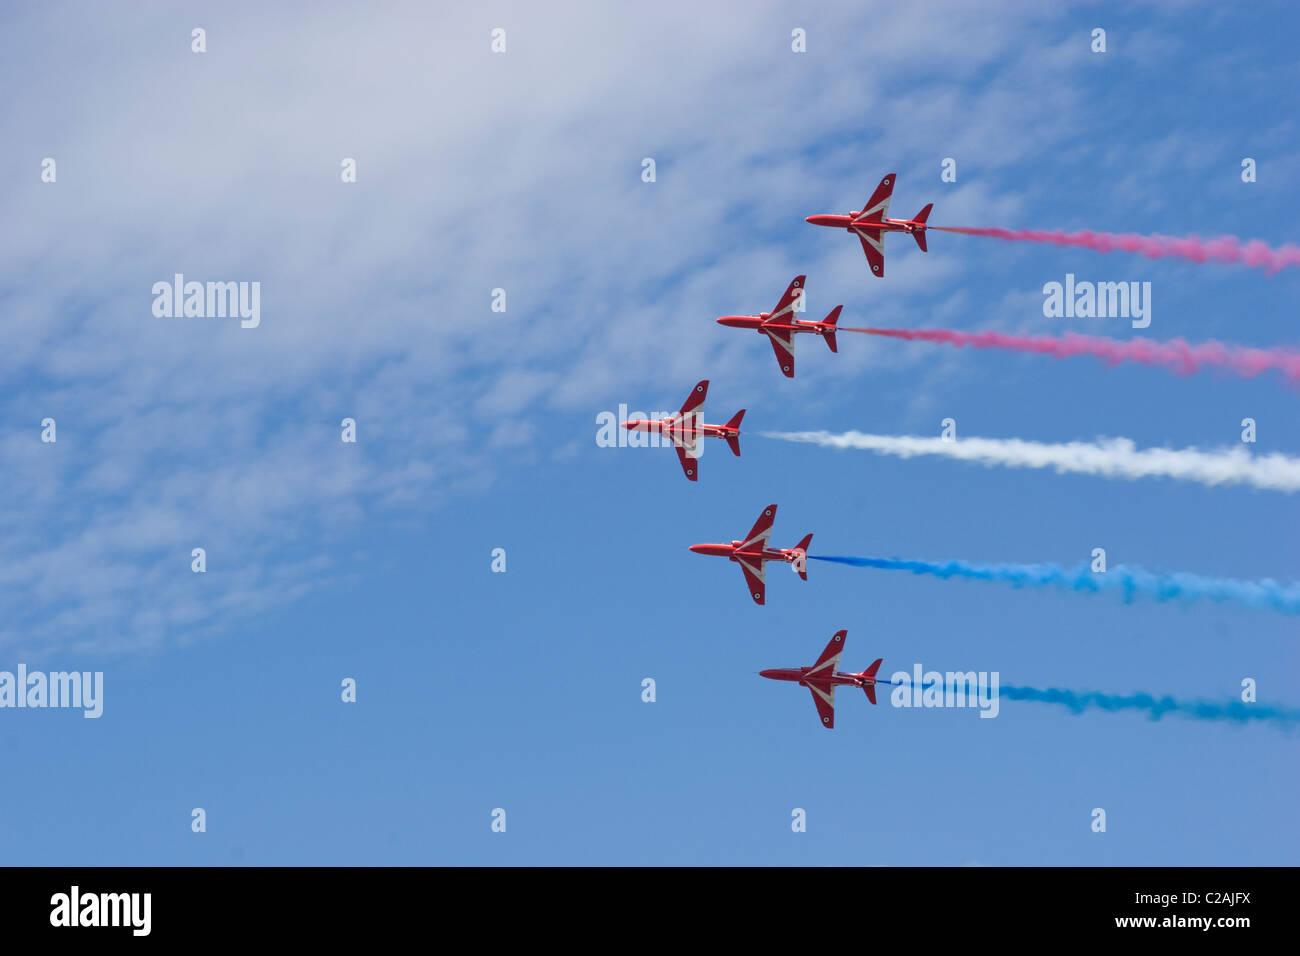 Red Arrows formation flying V aerobatics smoke trail Hawk white blue vapour blue sky sun underside 5 five close - Stock Image